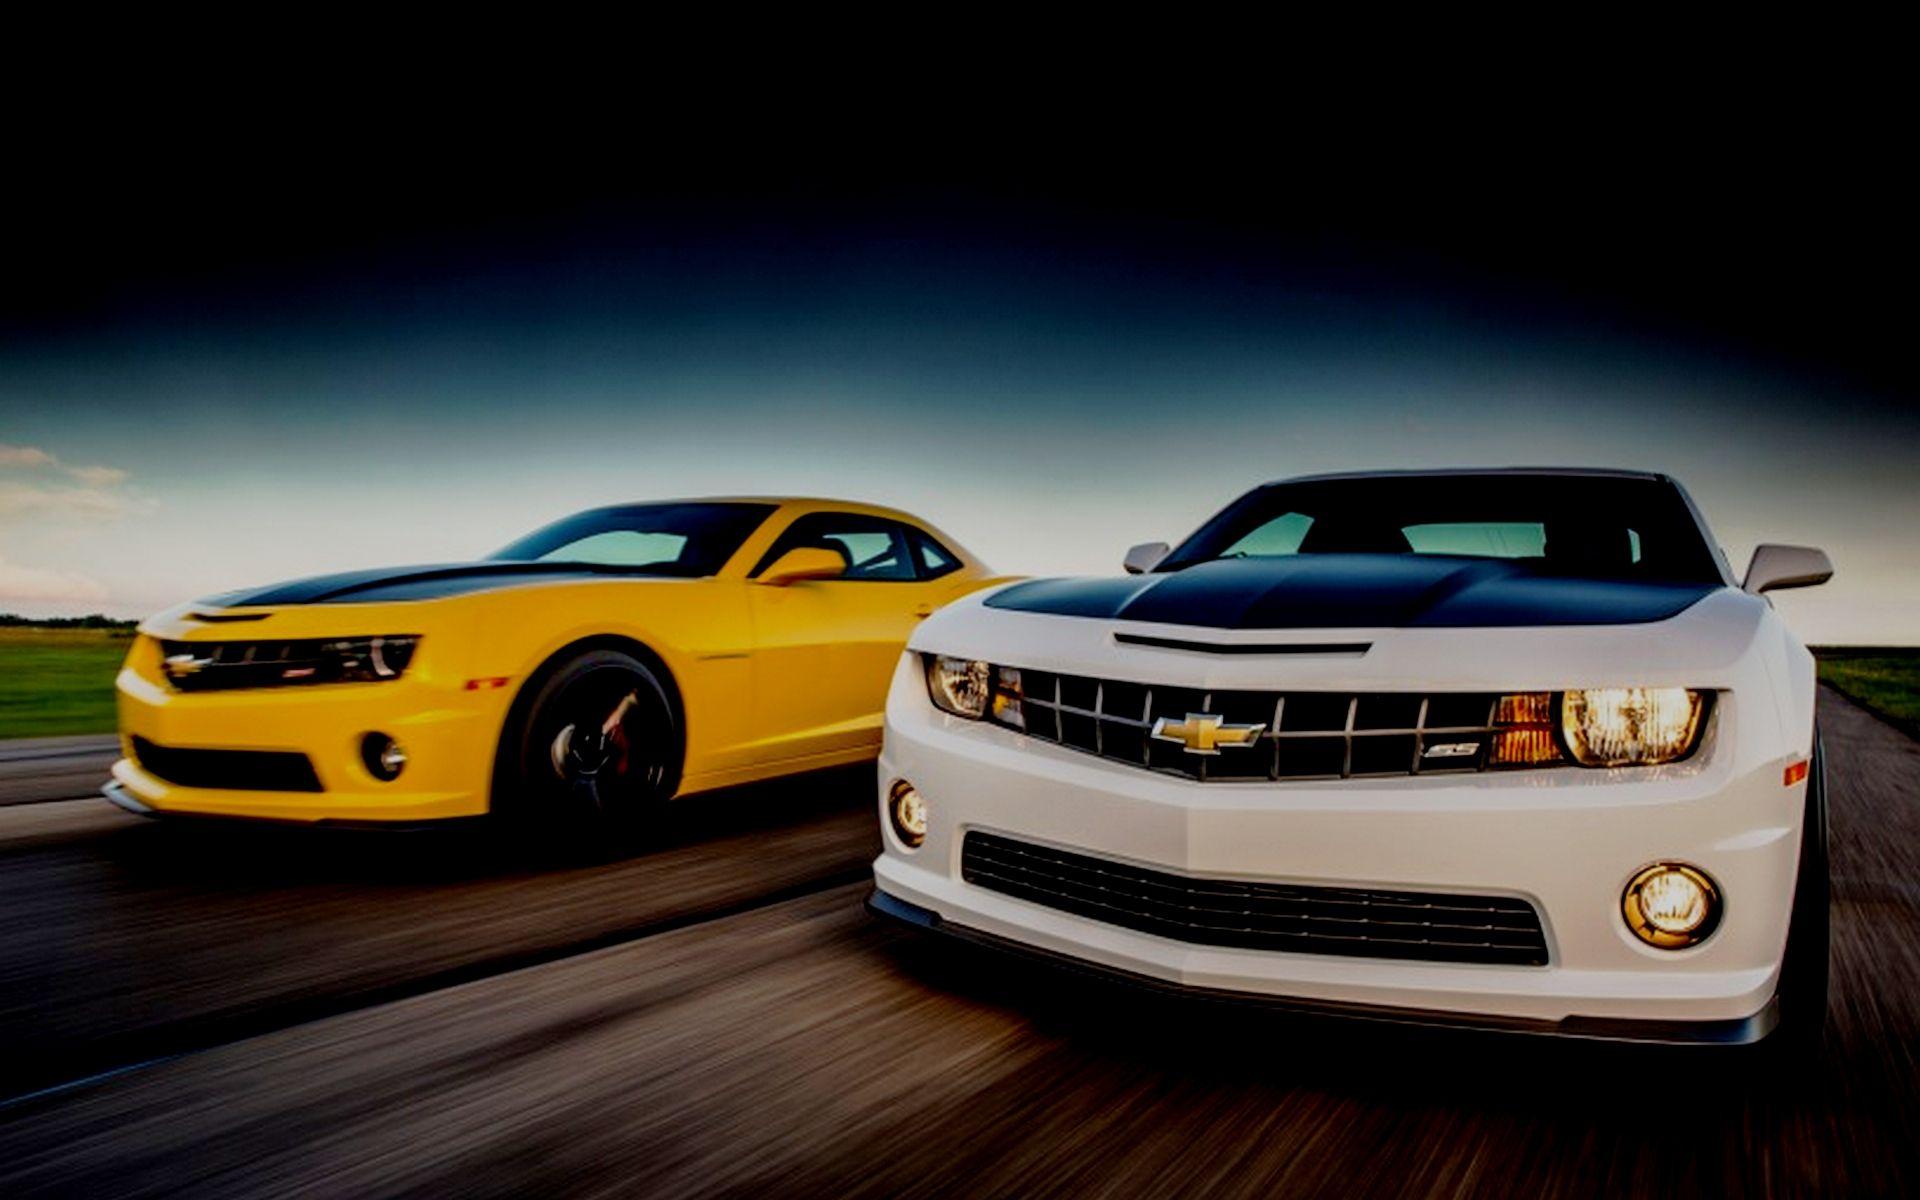 2015 Chevrolet Camaro Review 4K Wallpaper